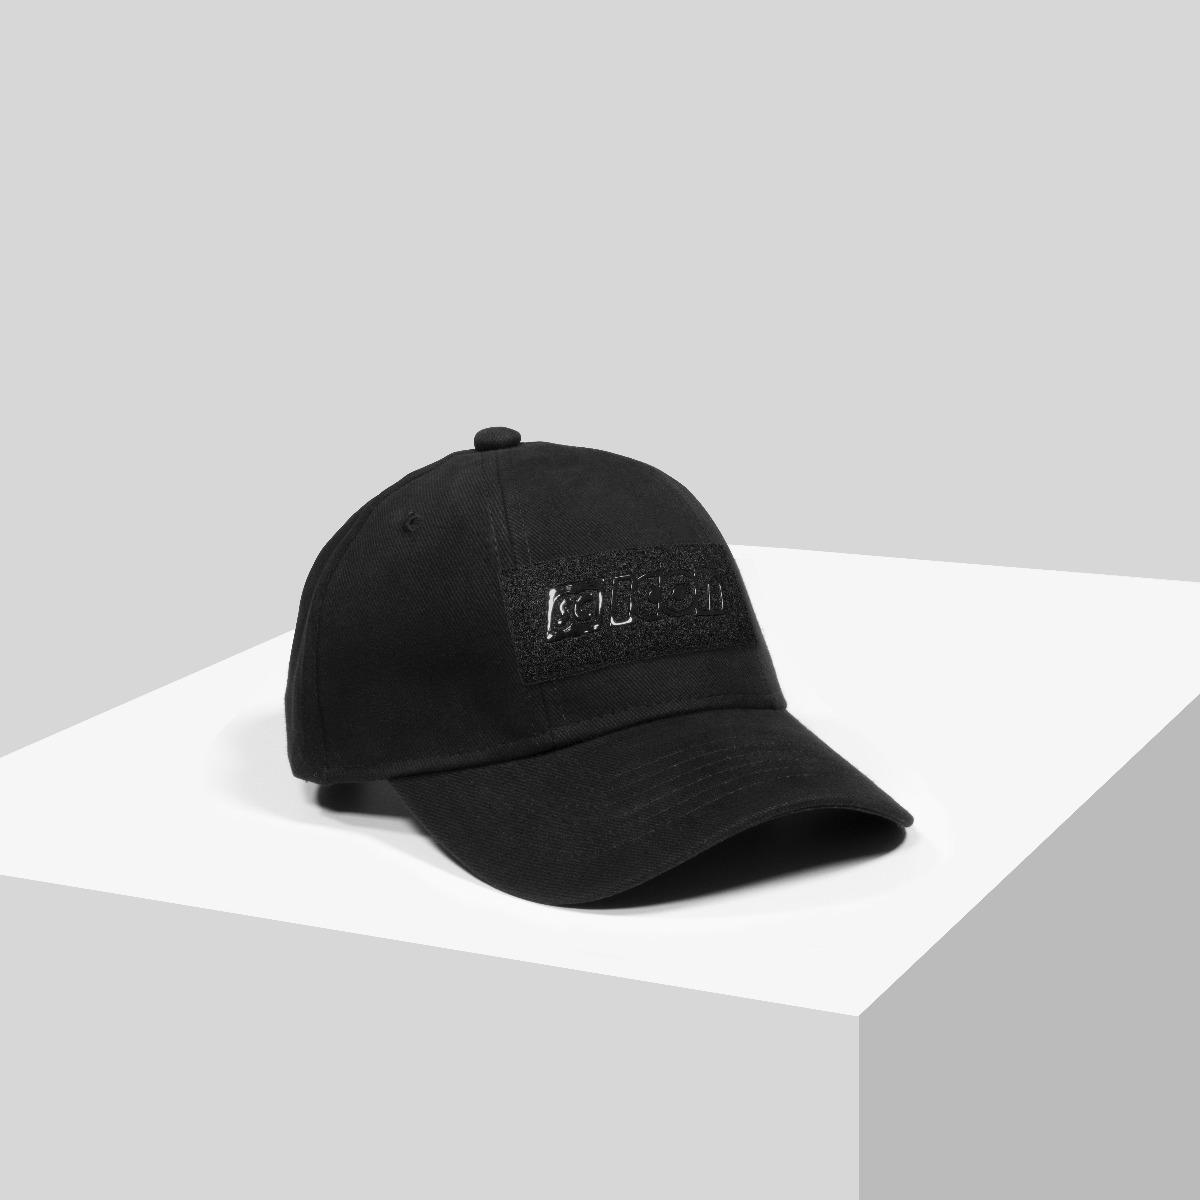 BLACKOUT LOGO BASEBALL CAP